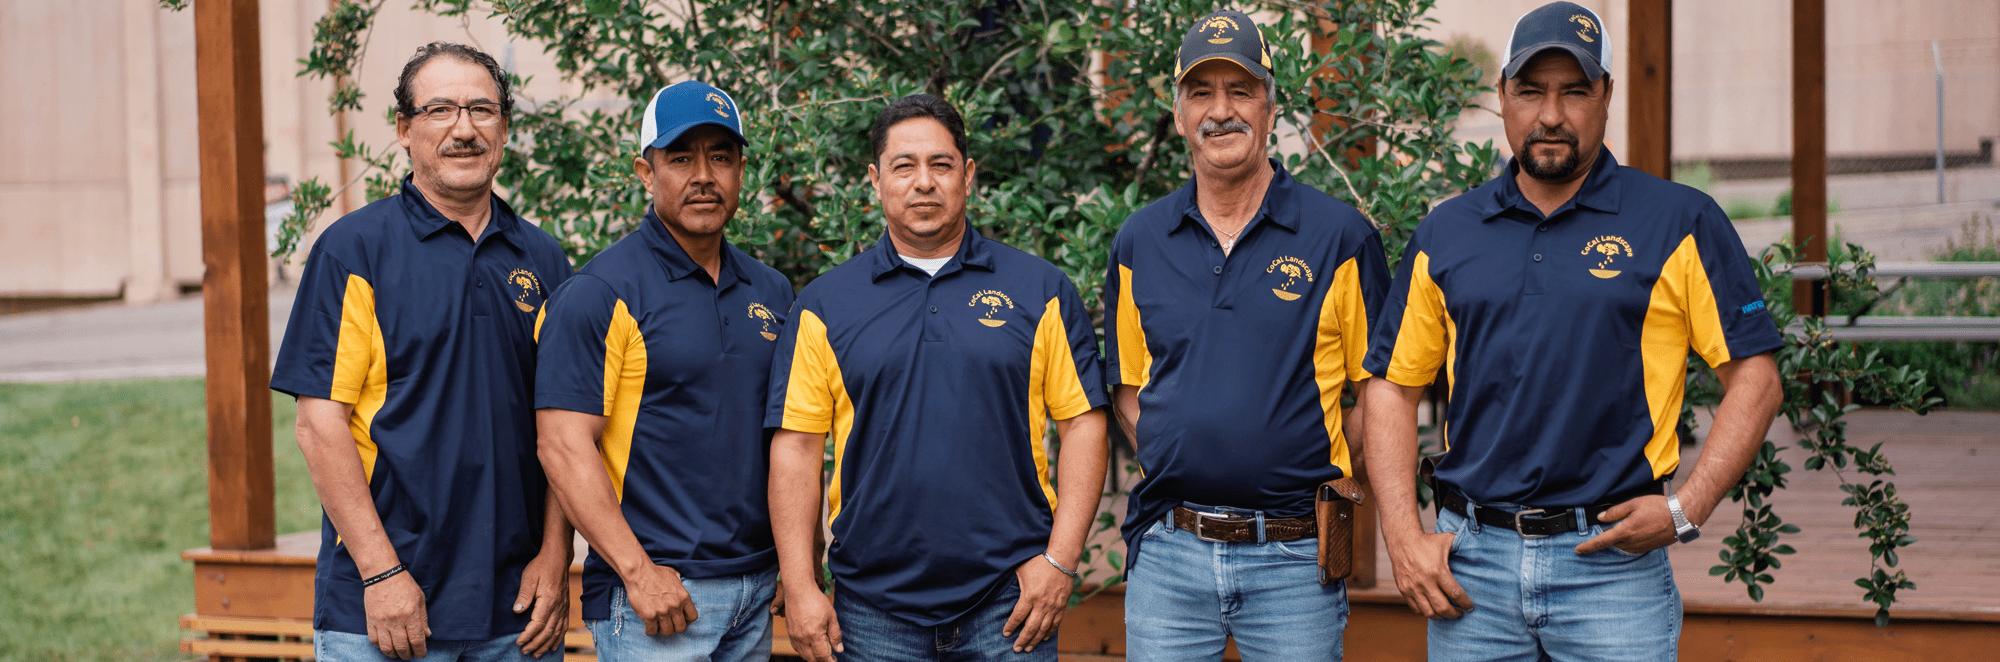 Denver, CO Landscaping Contractors